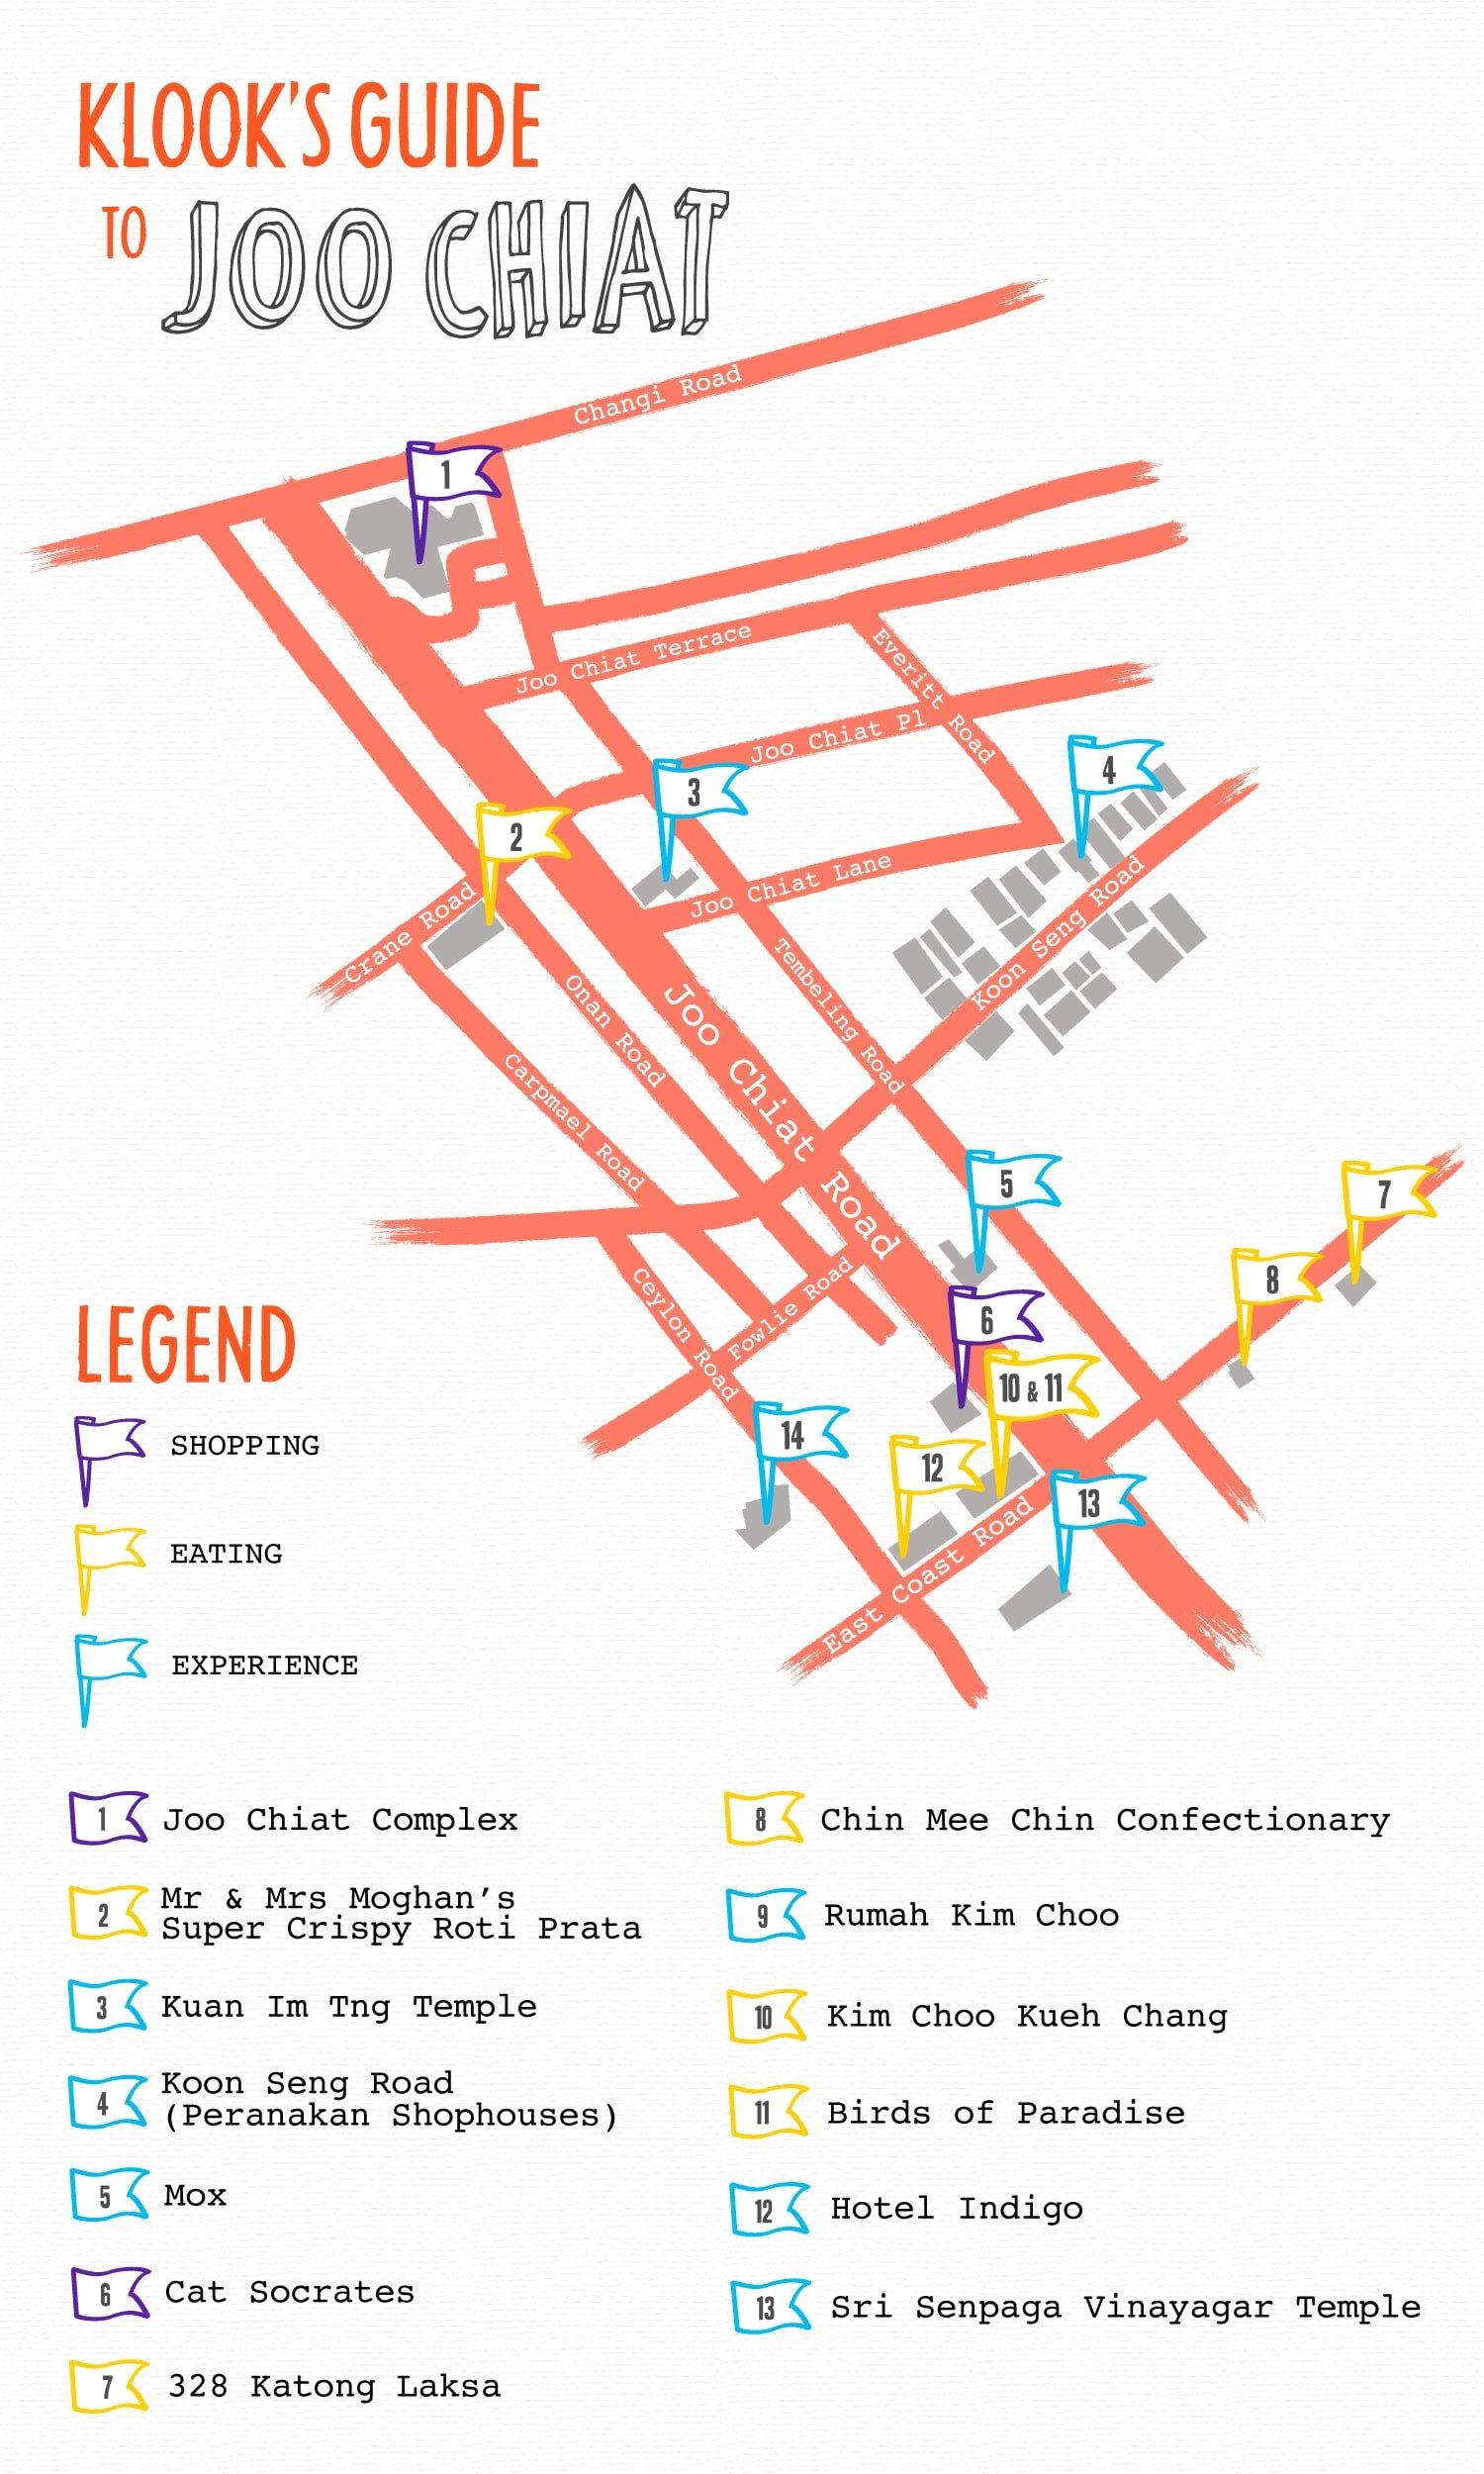 bản đồ phố joo chiat của klook